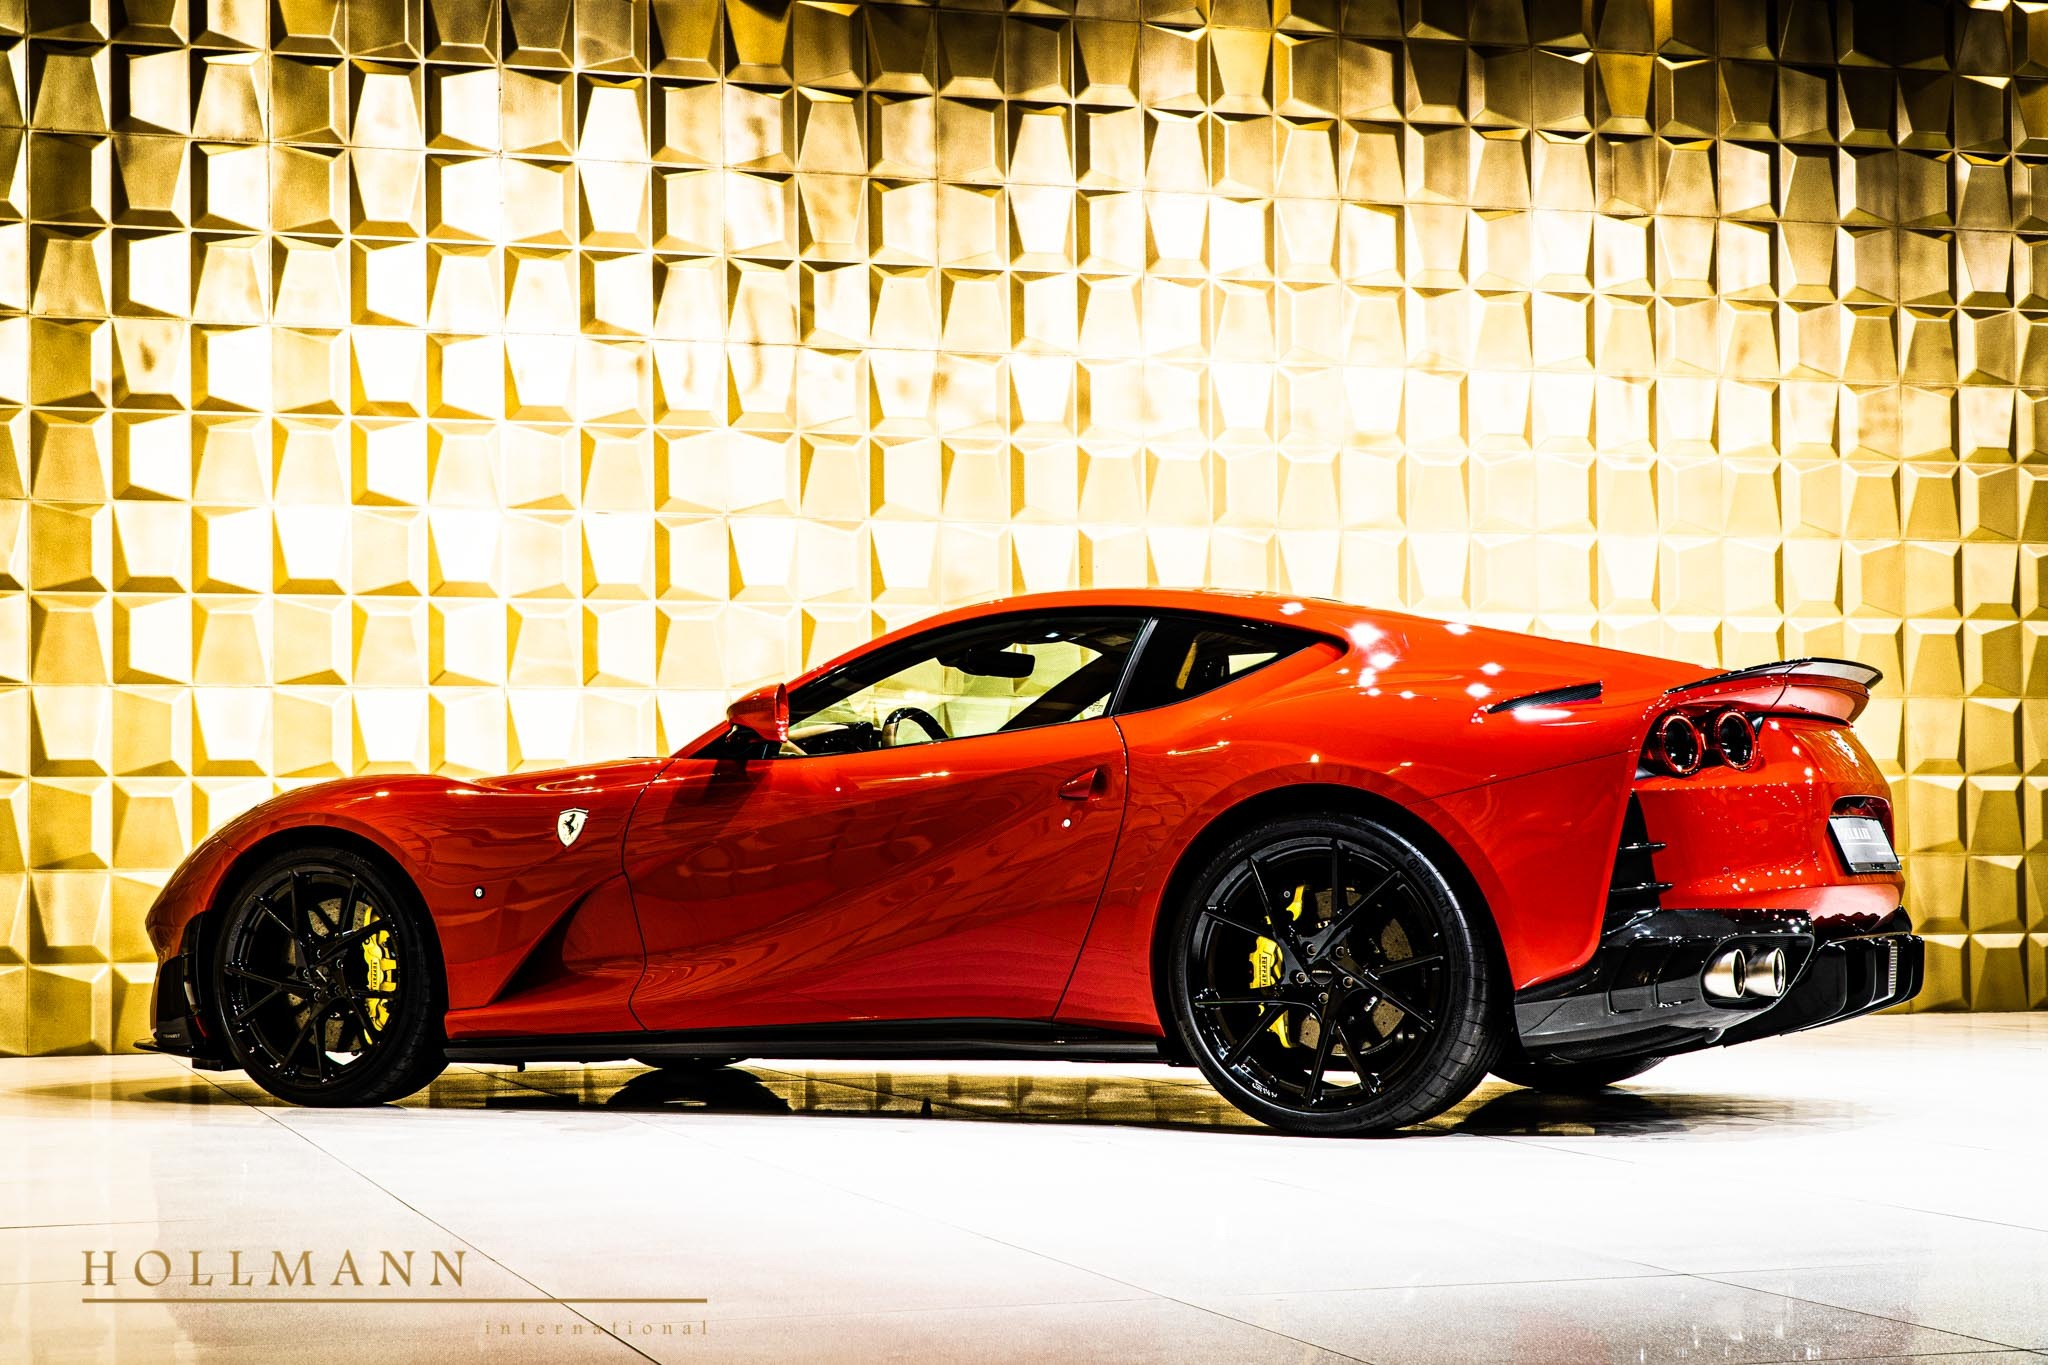 Ferrari 812 Superfast By Mansory Hollmann International Germany For Sale On Luxurypulse